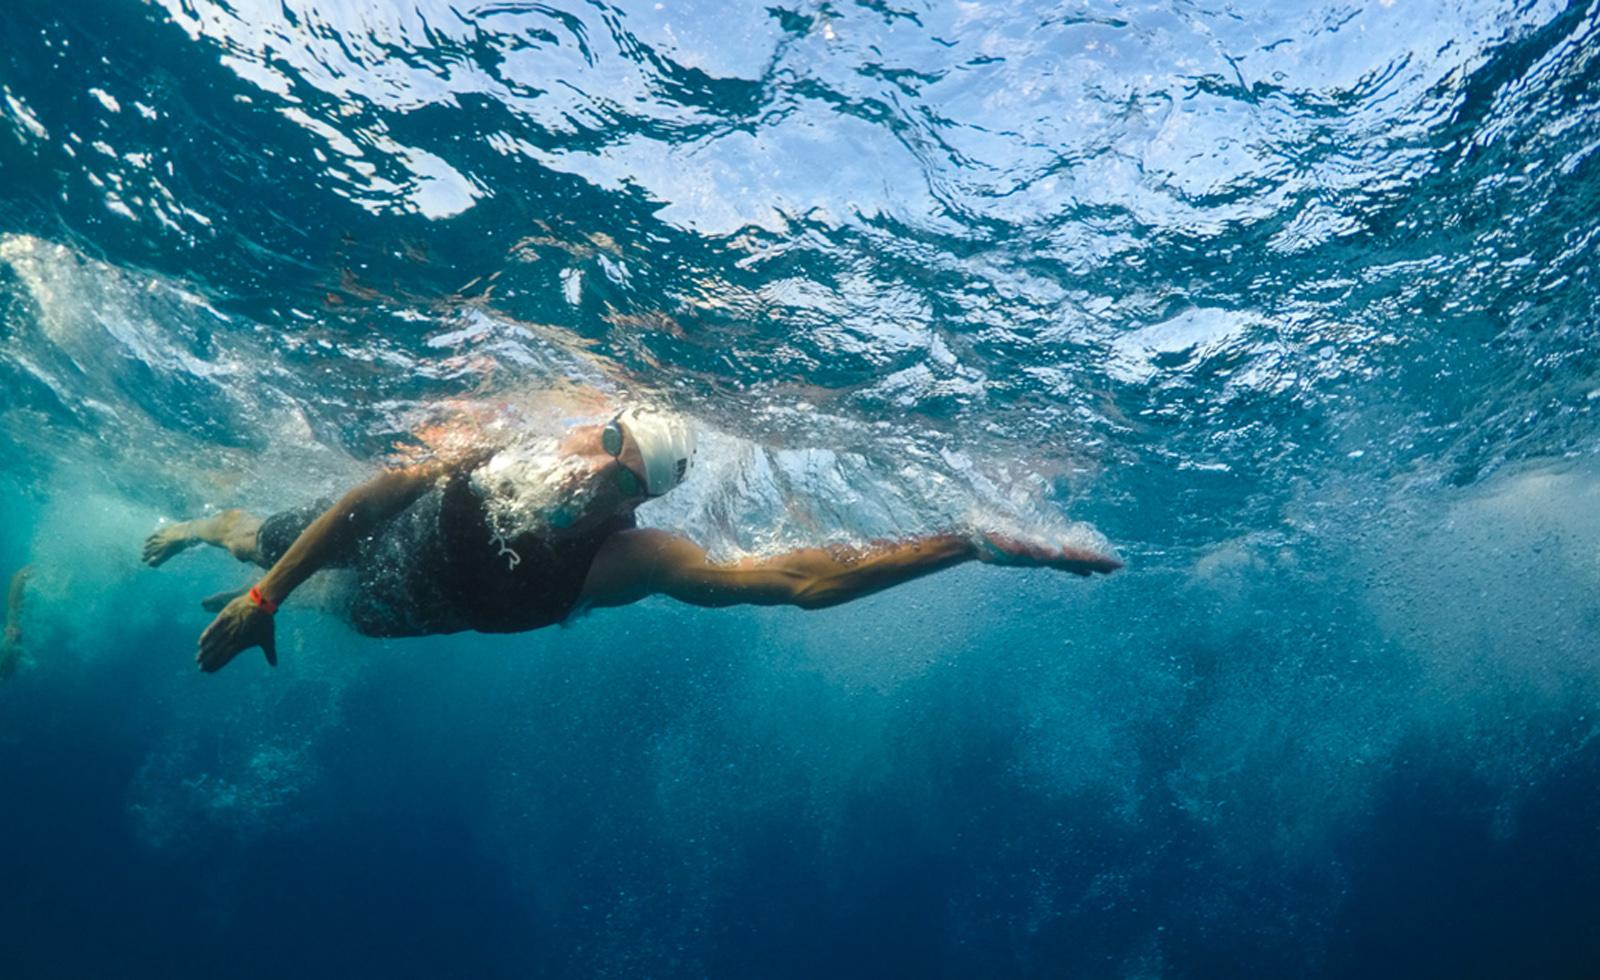 underwater-hughgentry-1600